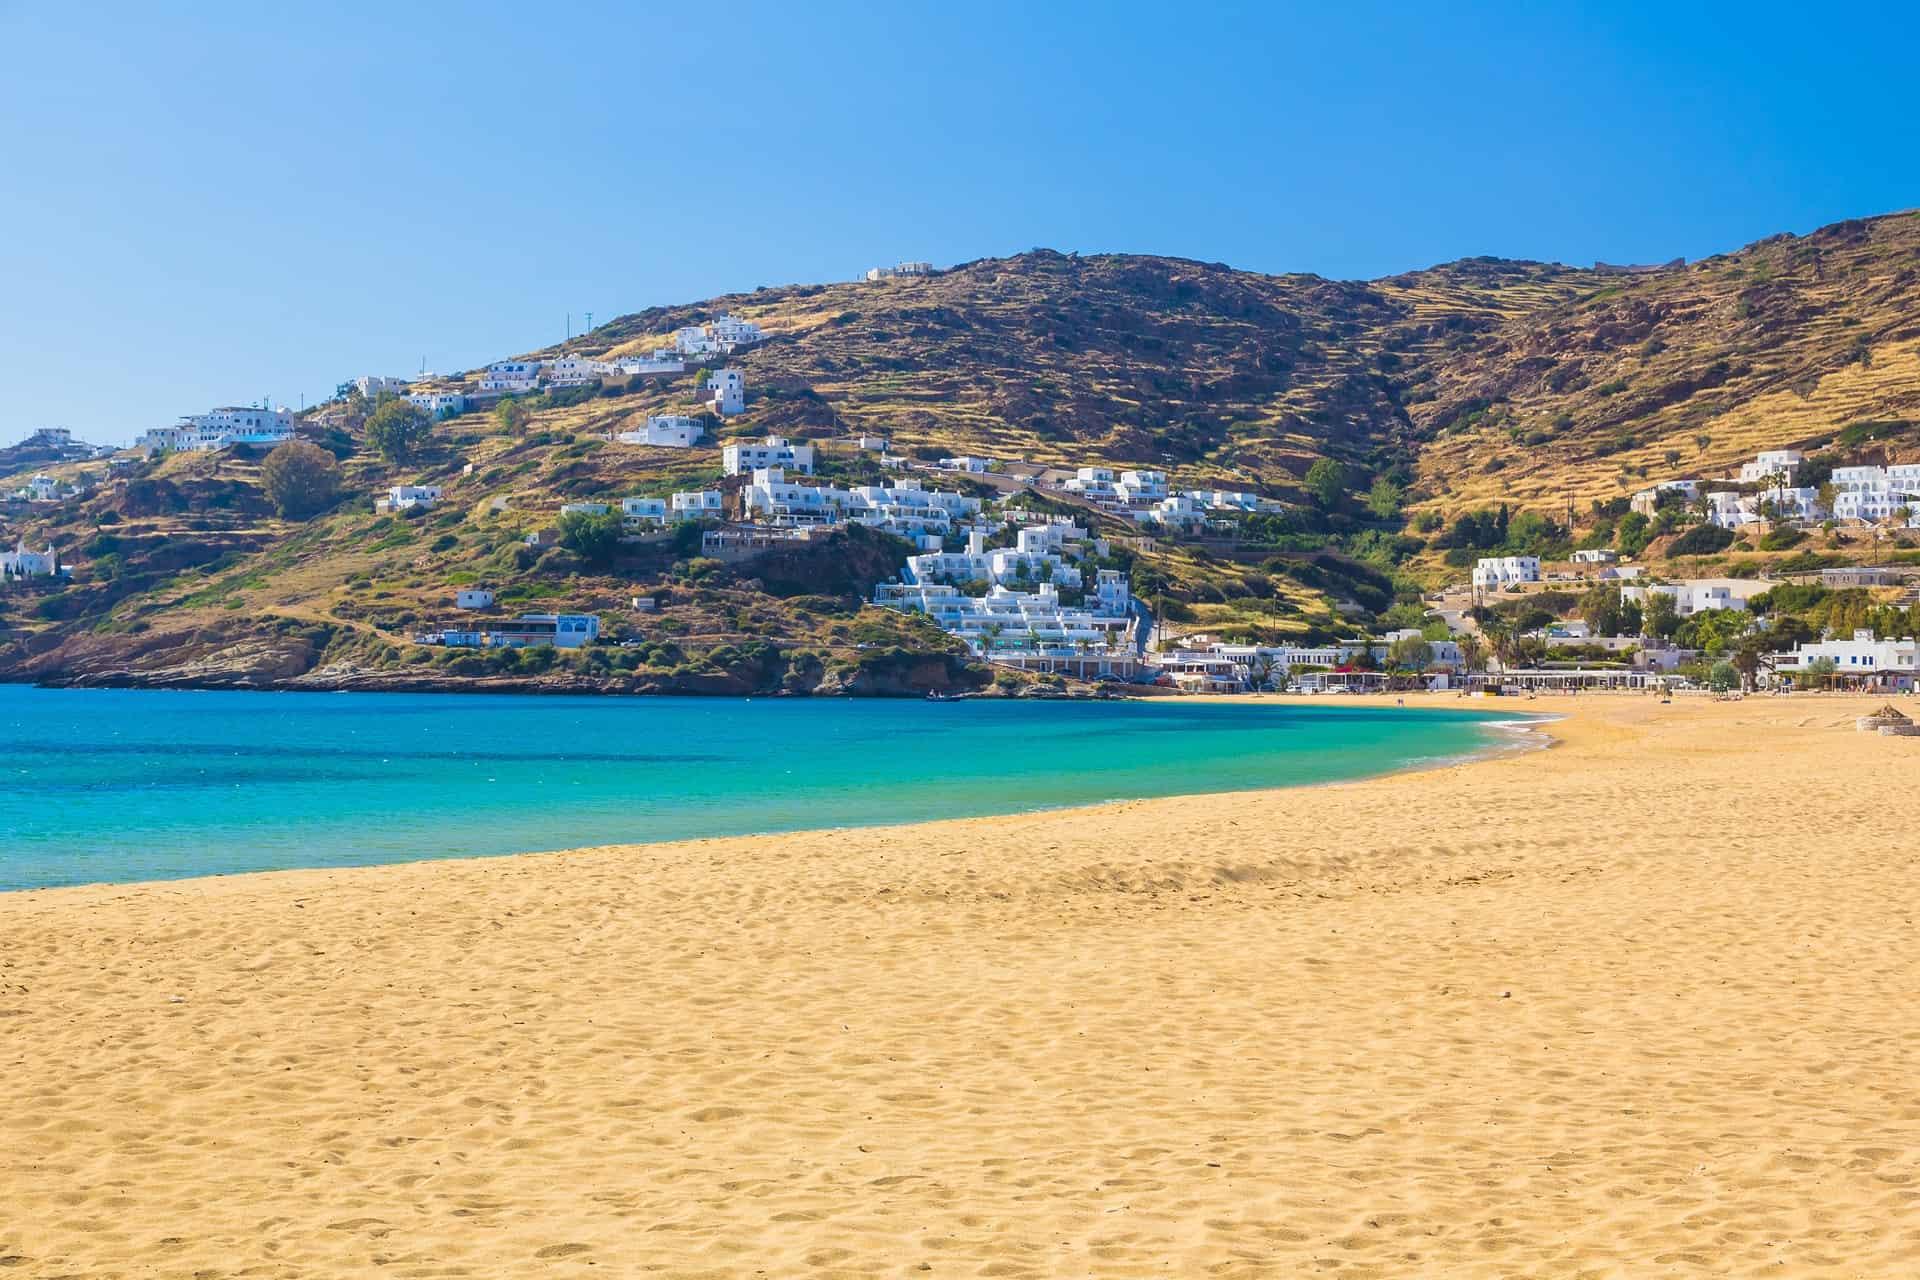 Ios vacanze tra spiagge incantate e mille chiesette